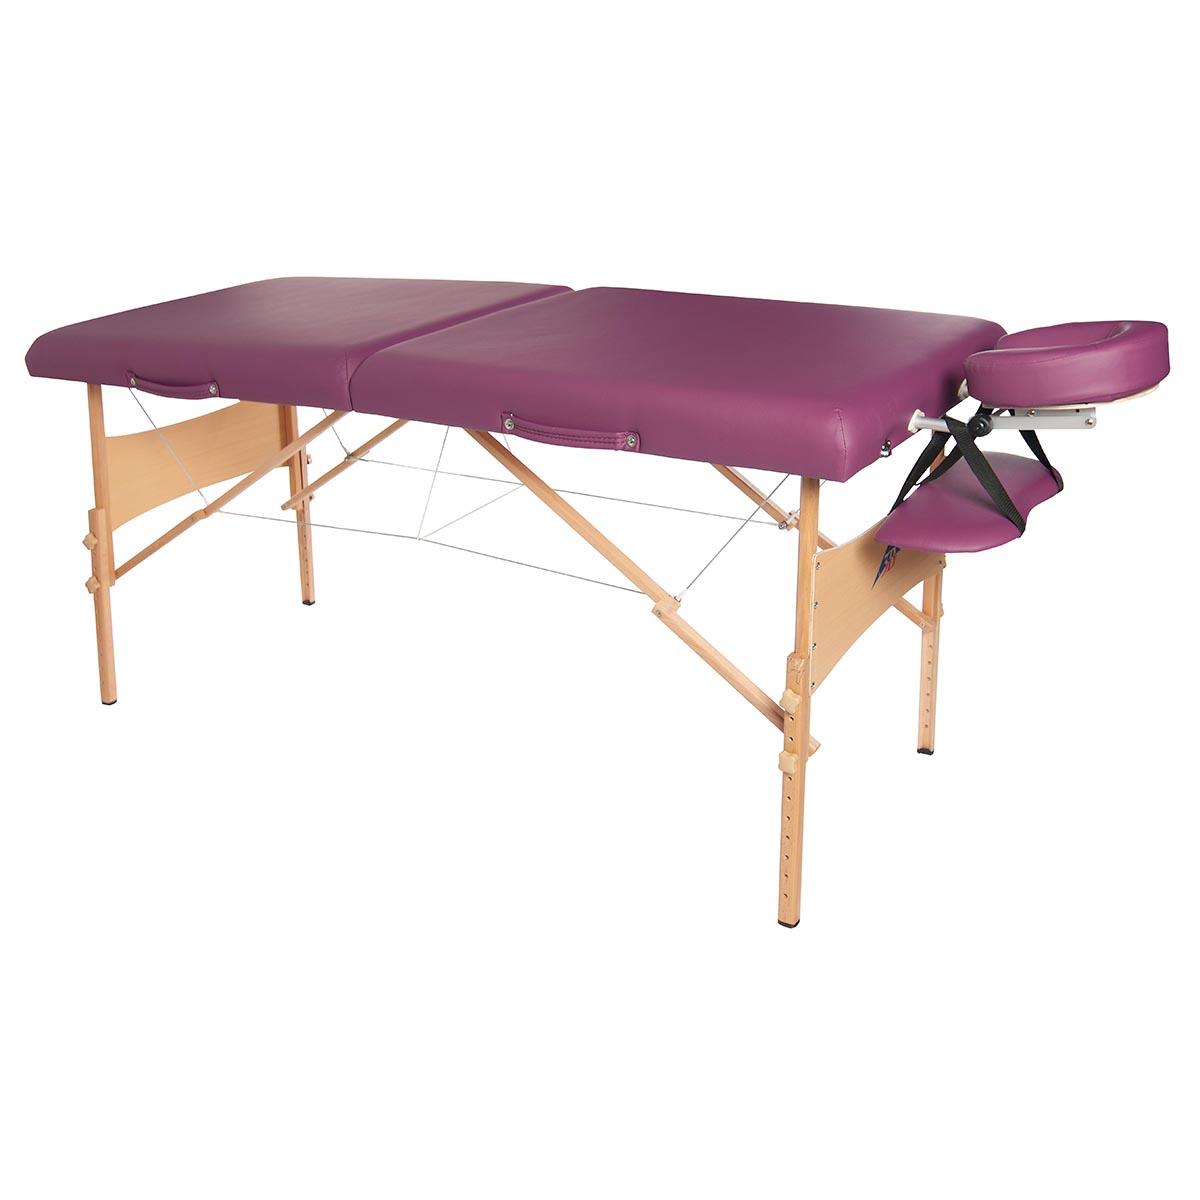 "New BestMassage Black 77""L 3"" Pad Portable Massage Table ... |Massage Table"